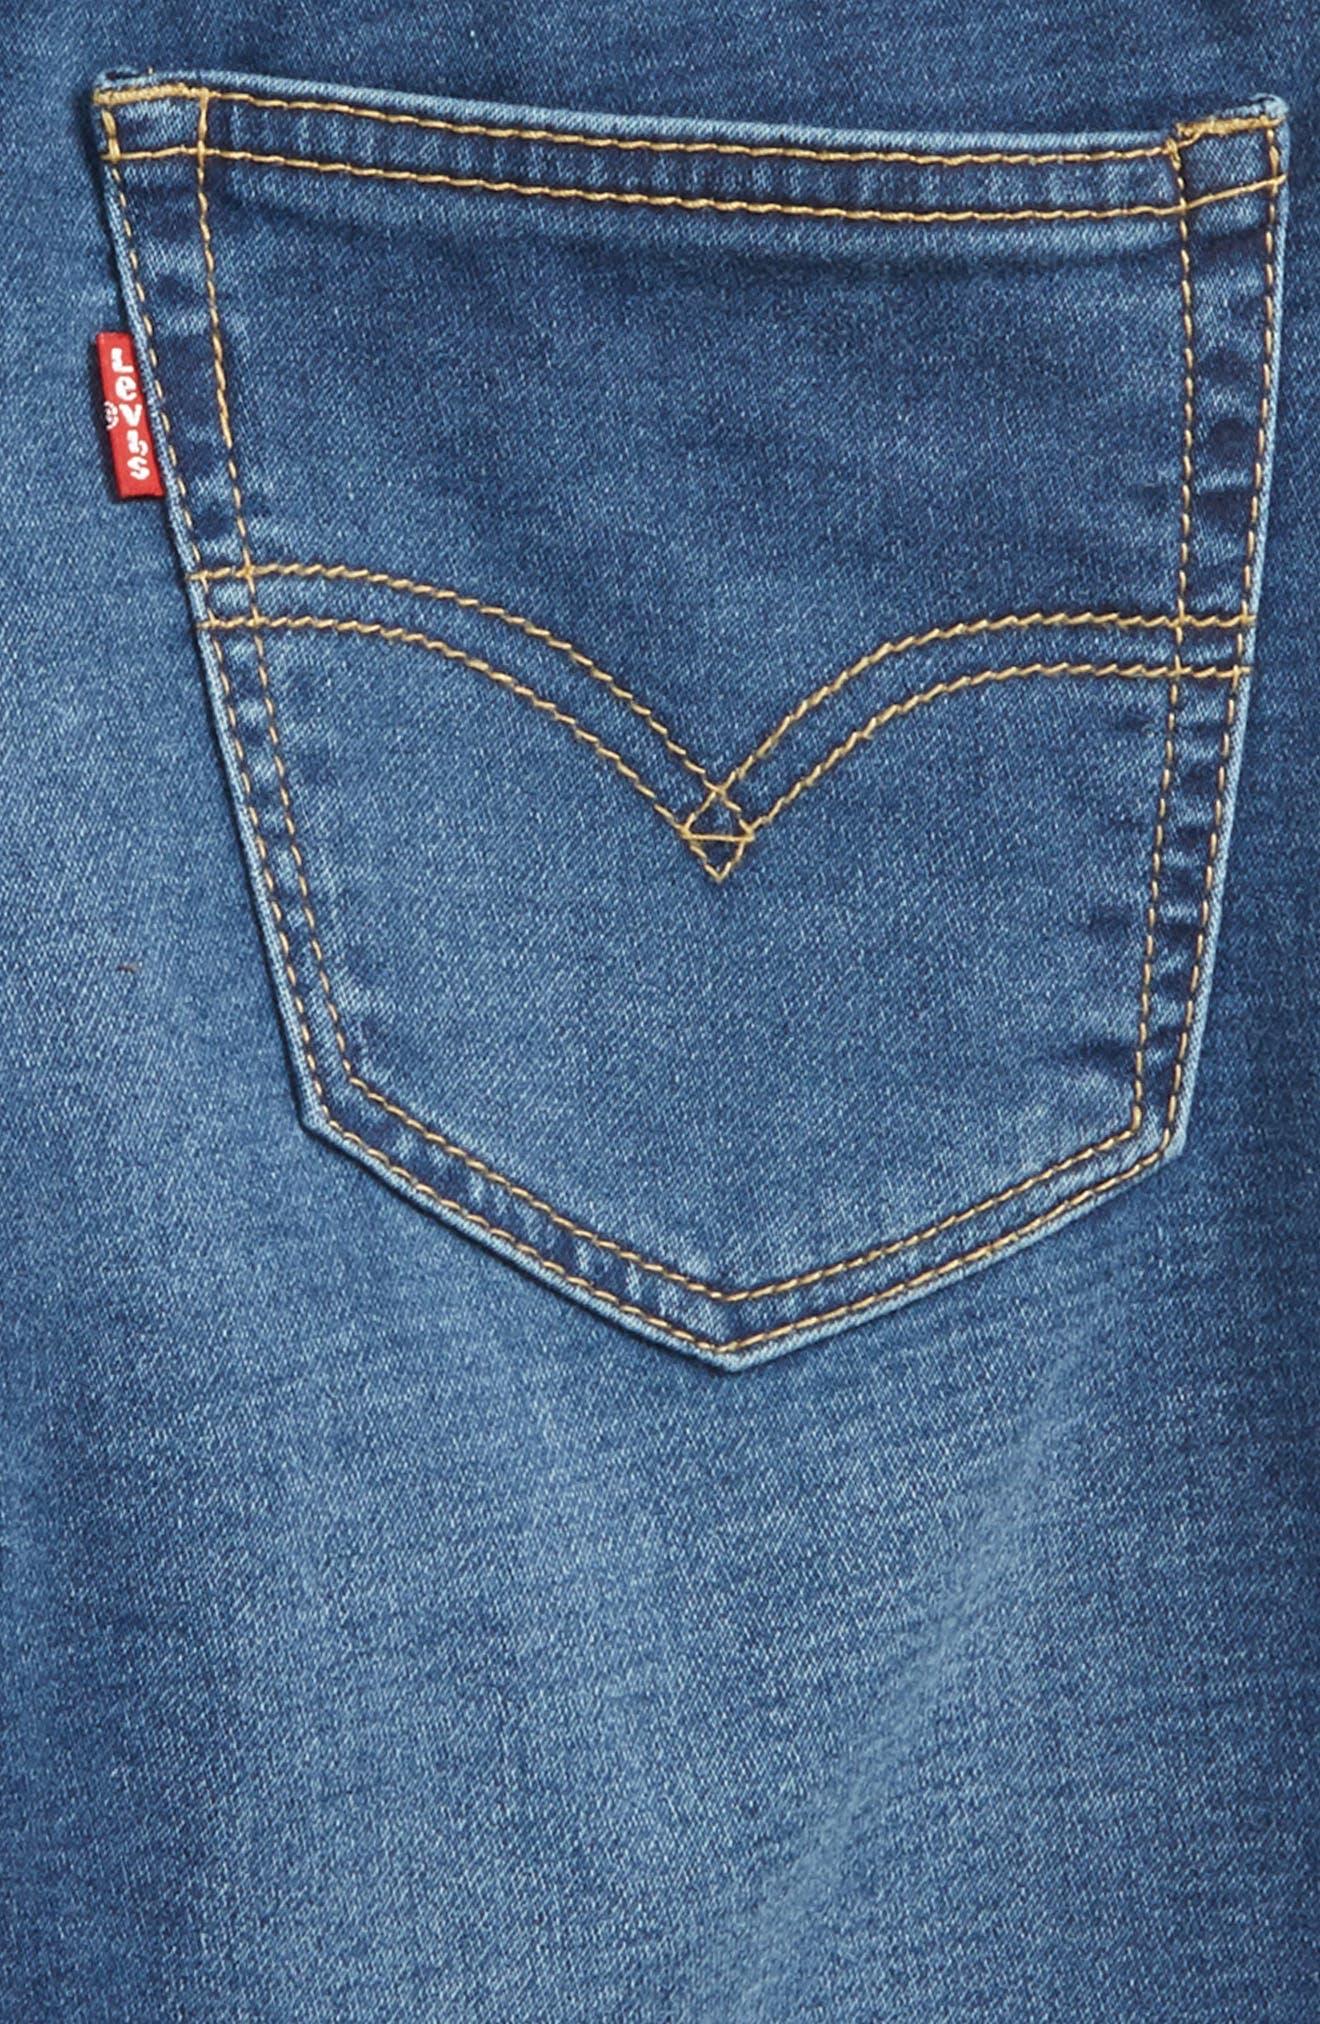 Levi's Super Chill Denim Shorts,                             Alternate thumbnail 3, color,                             Coastal Sd